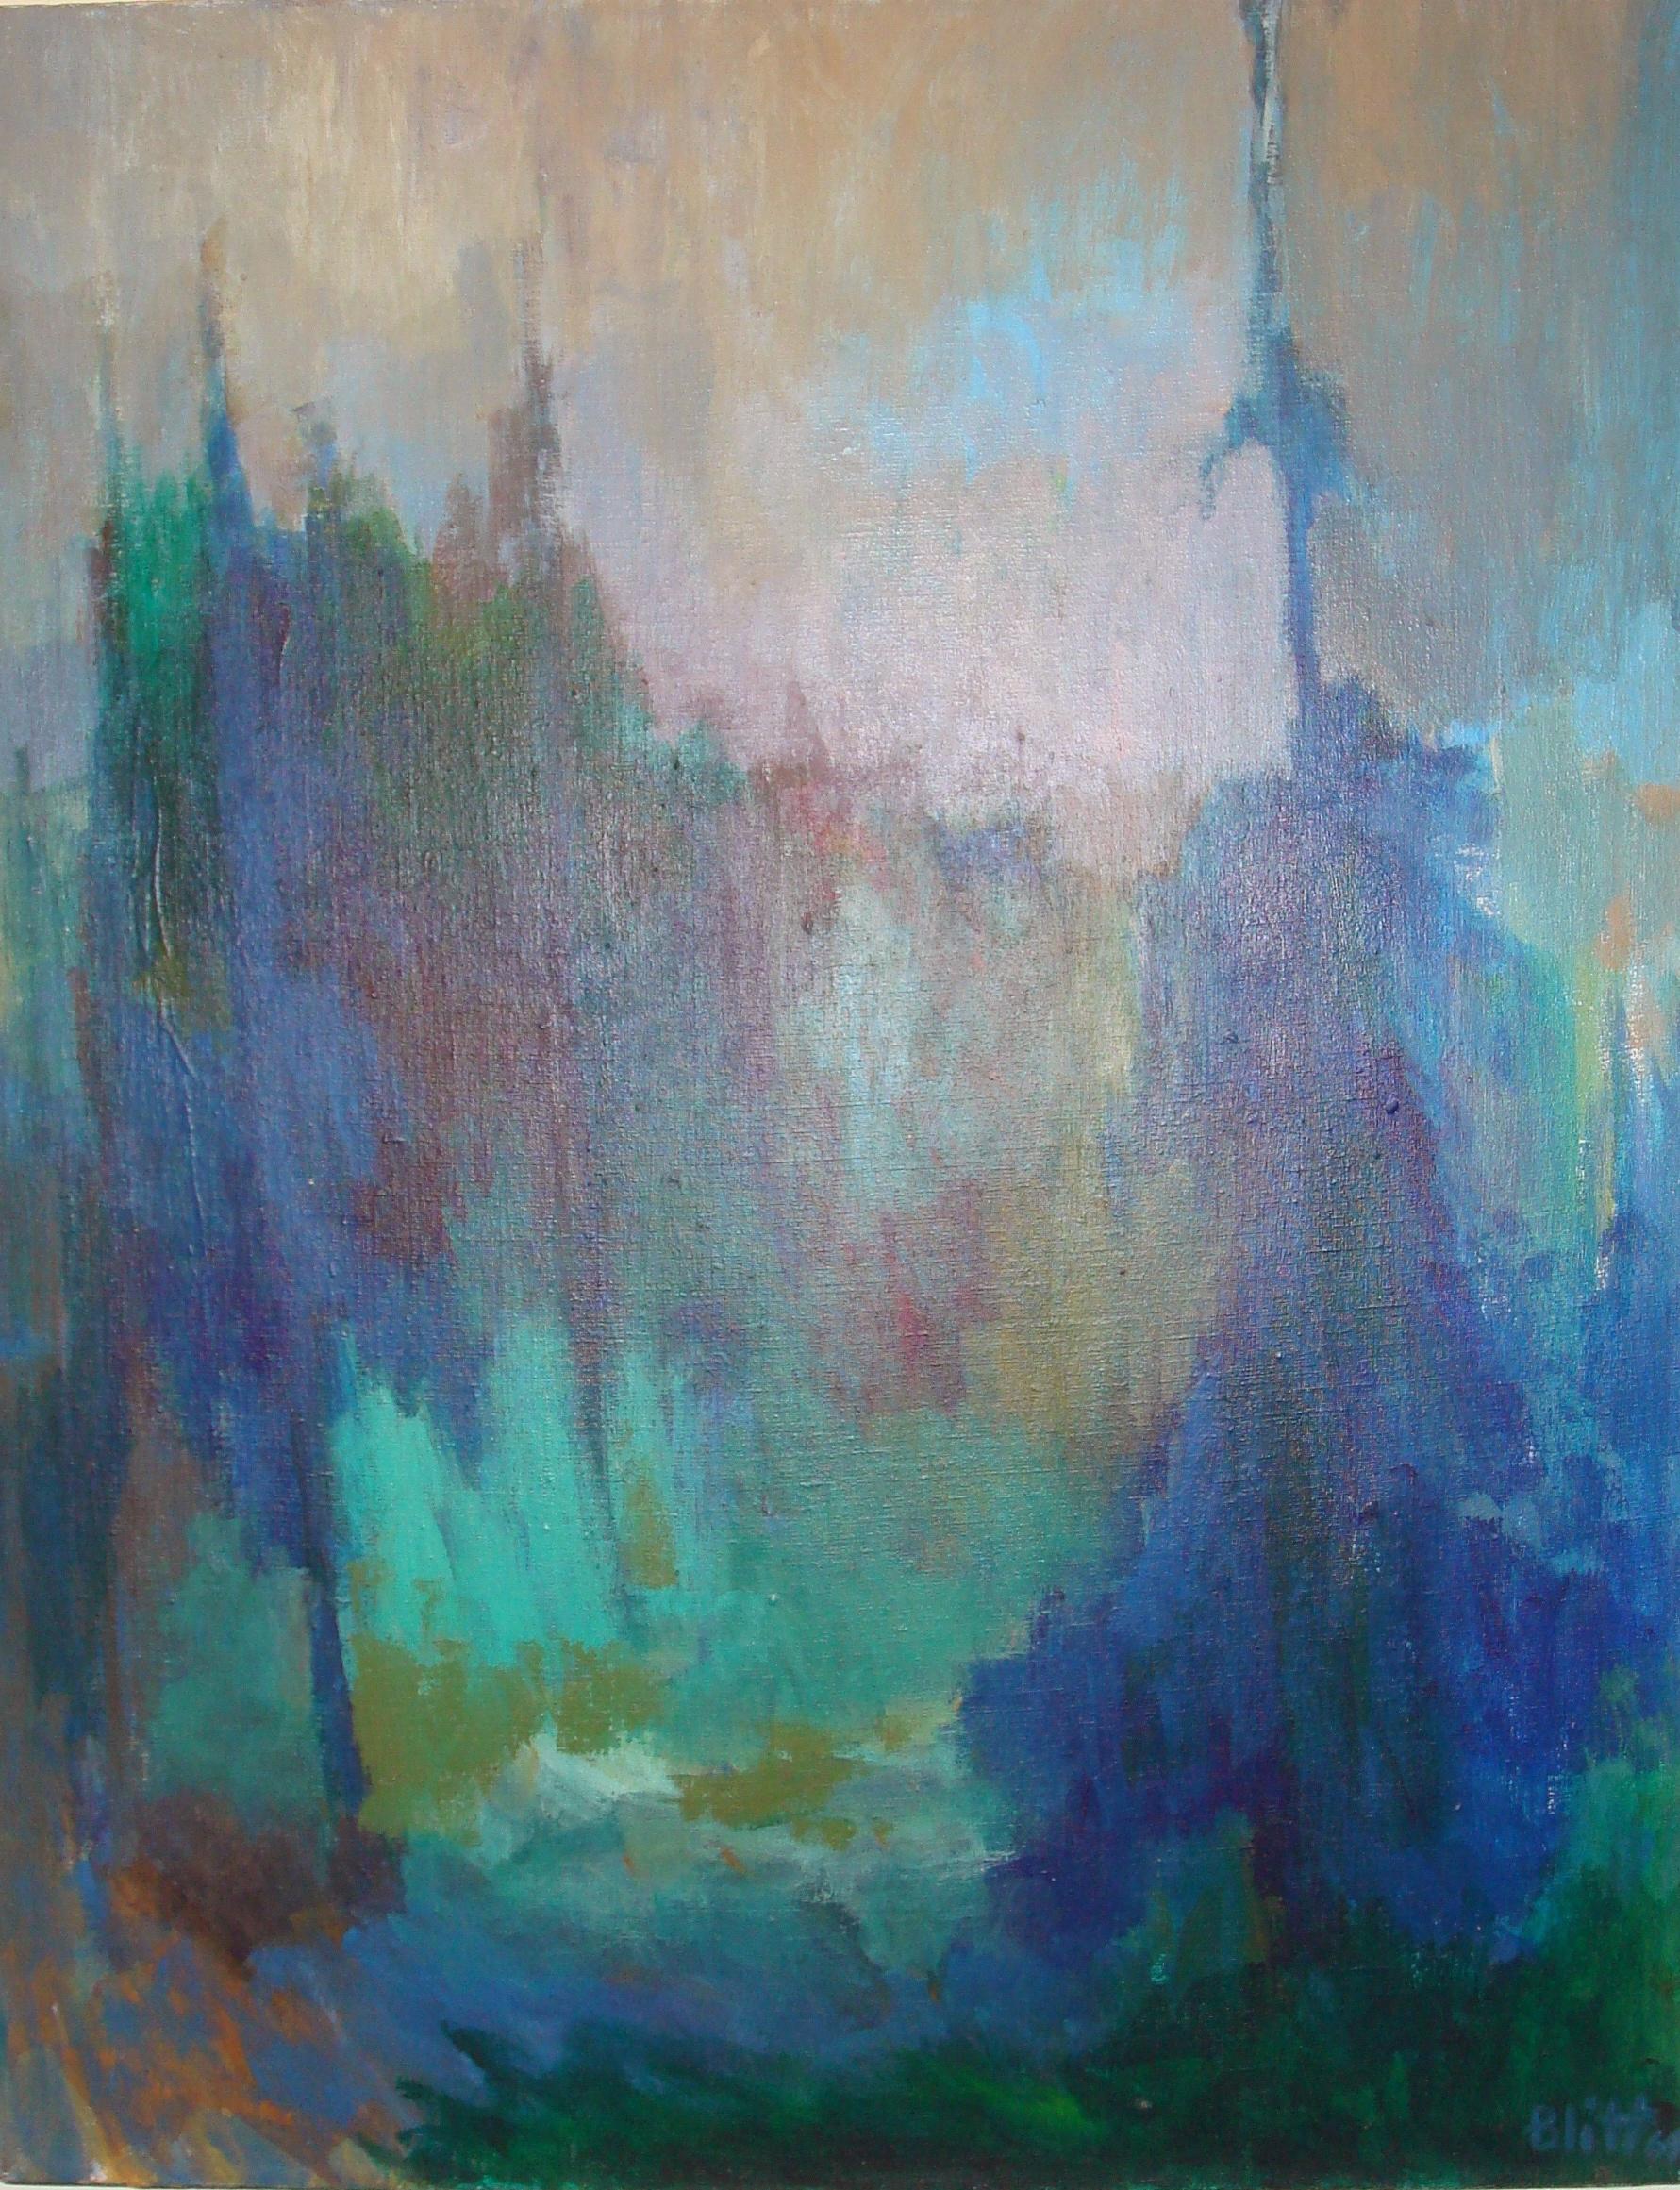 Fir Trees in Aspen  1964, acrylic on canvas, 40x30 in